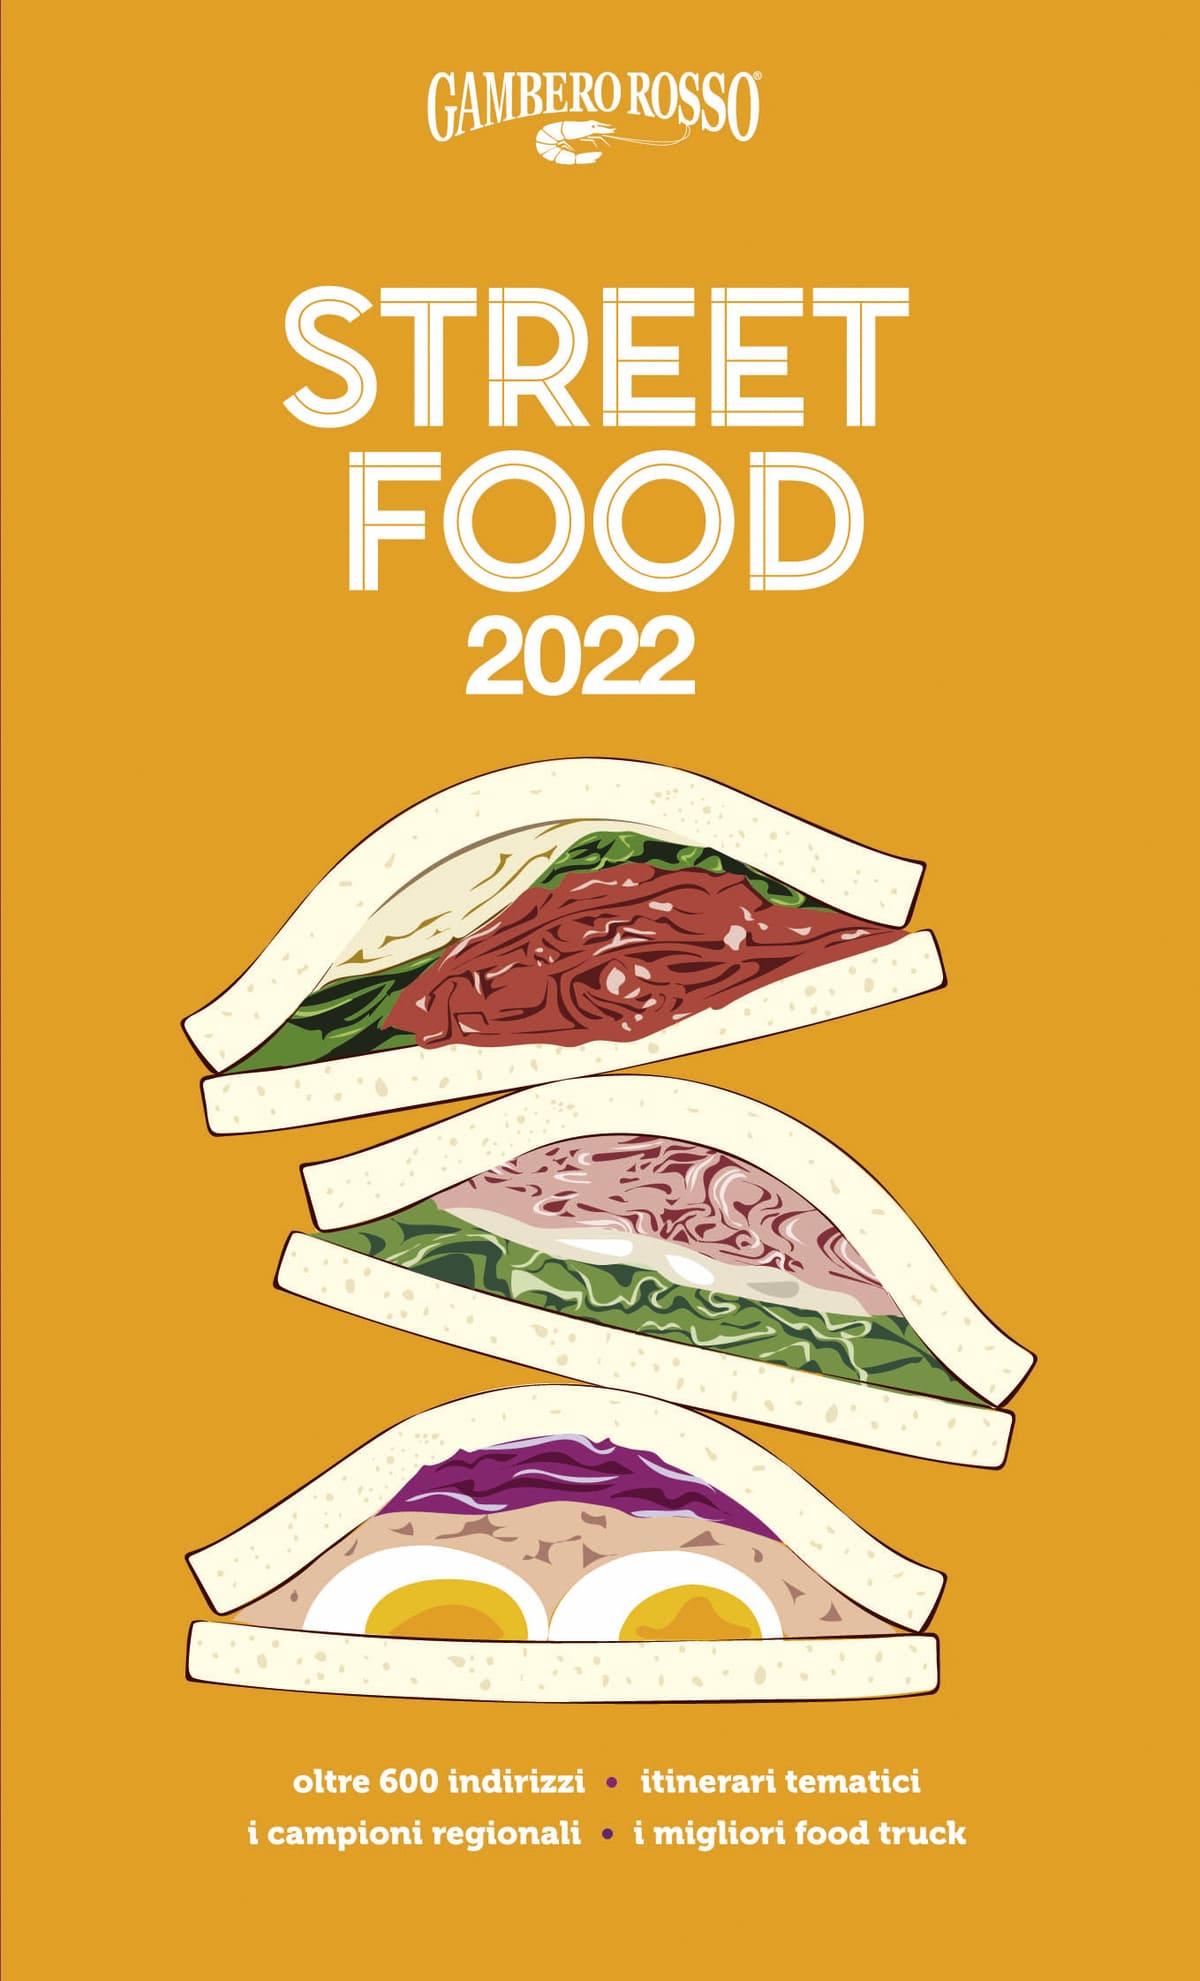 Gambero Rosso guida street food 2022